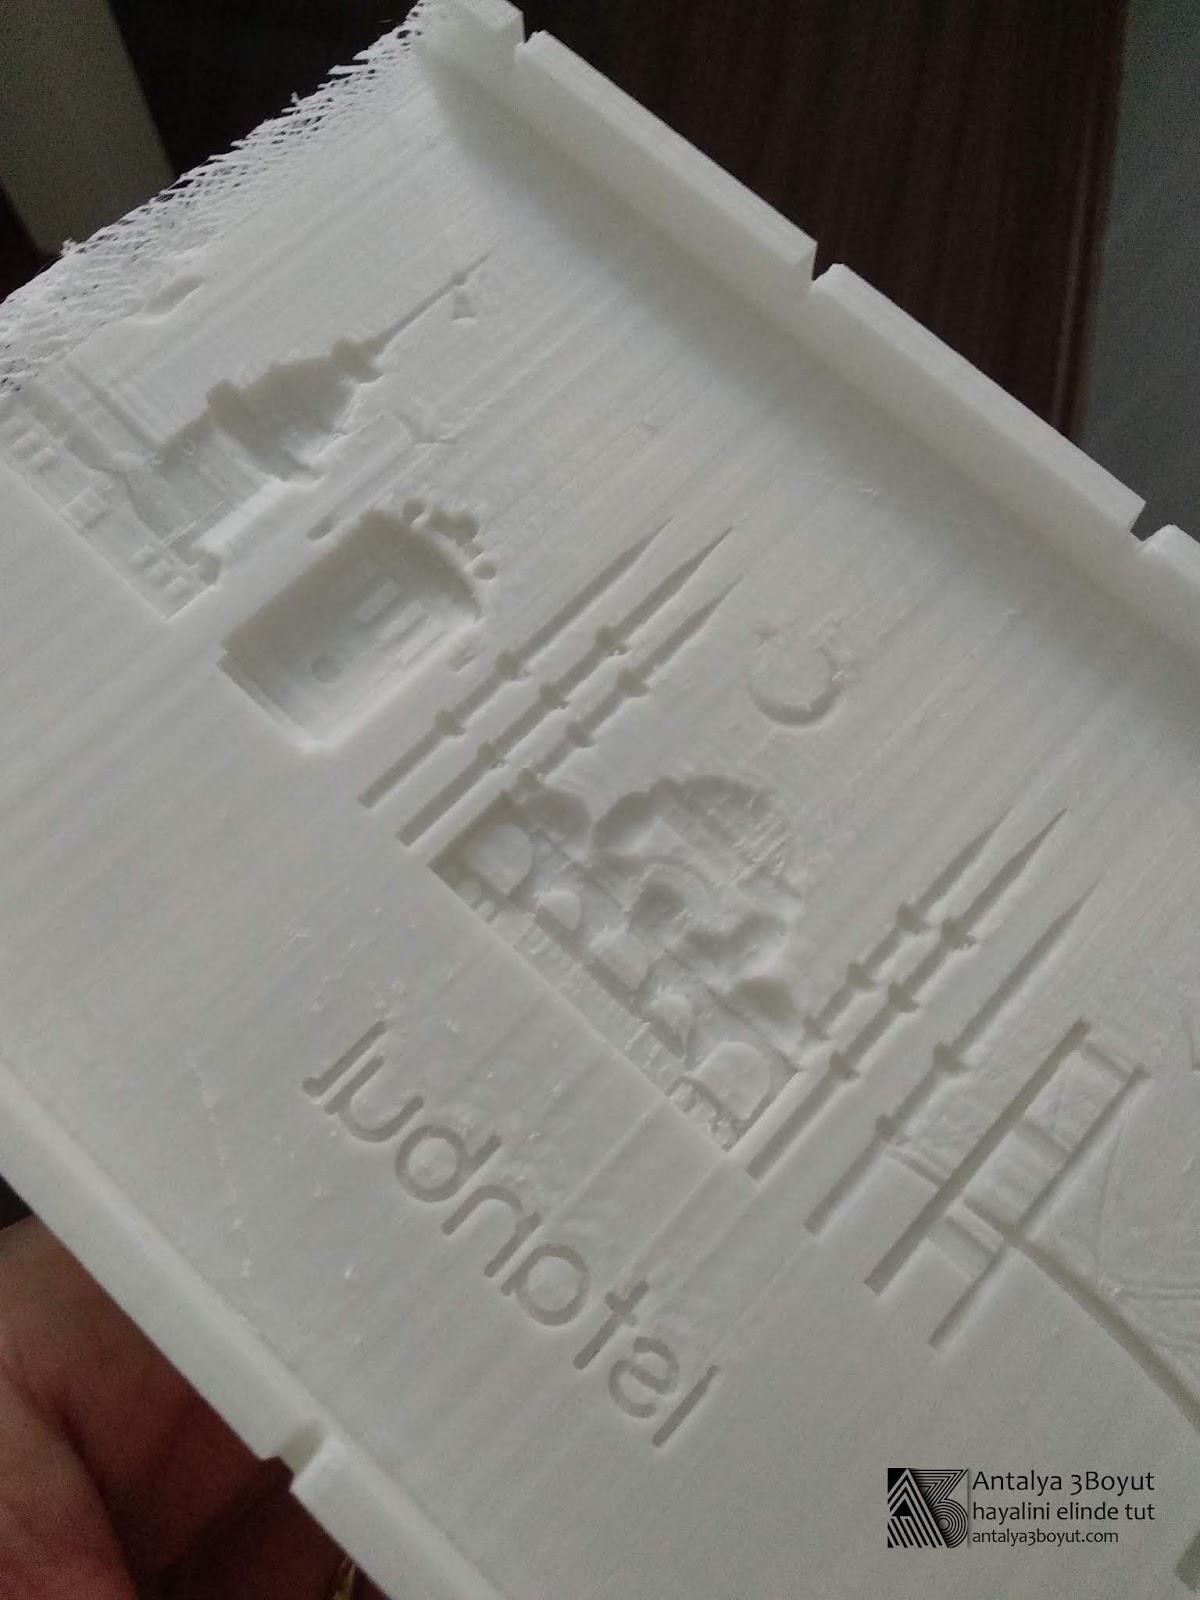 3d printed moulding